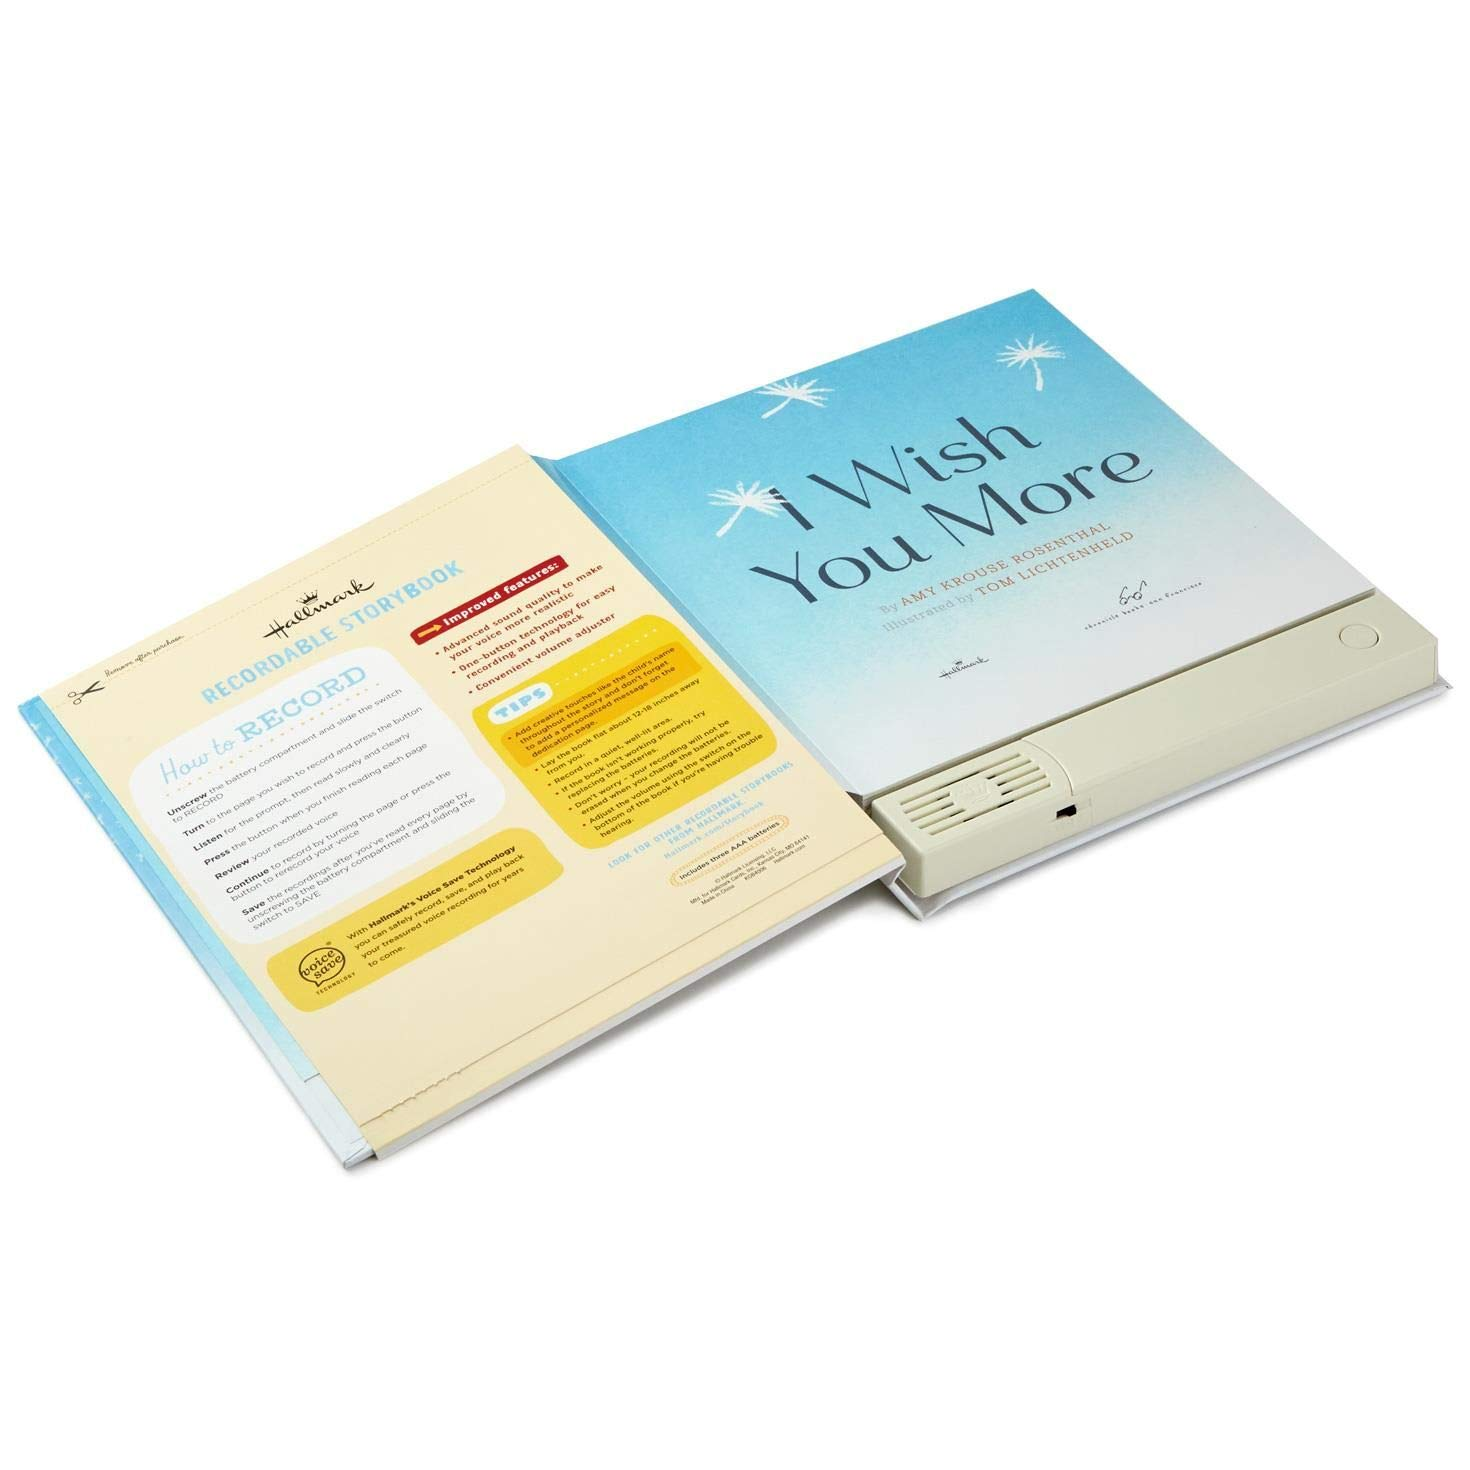 Hallmark I Wish You More Recordable Storybook Recordable Storybooks Juvenile Nonfiction by Hallmark (Image #5)